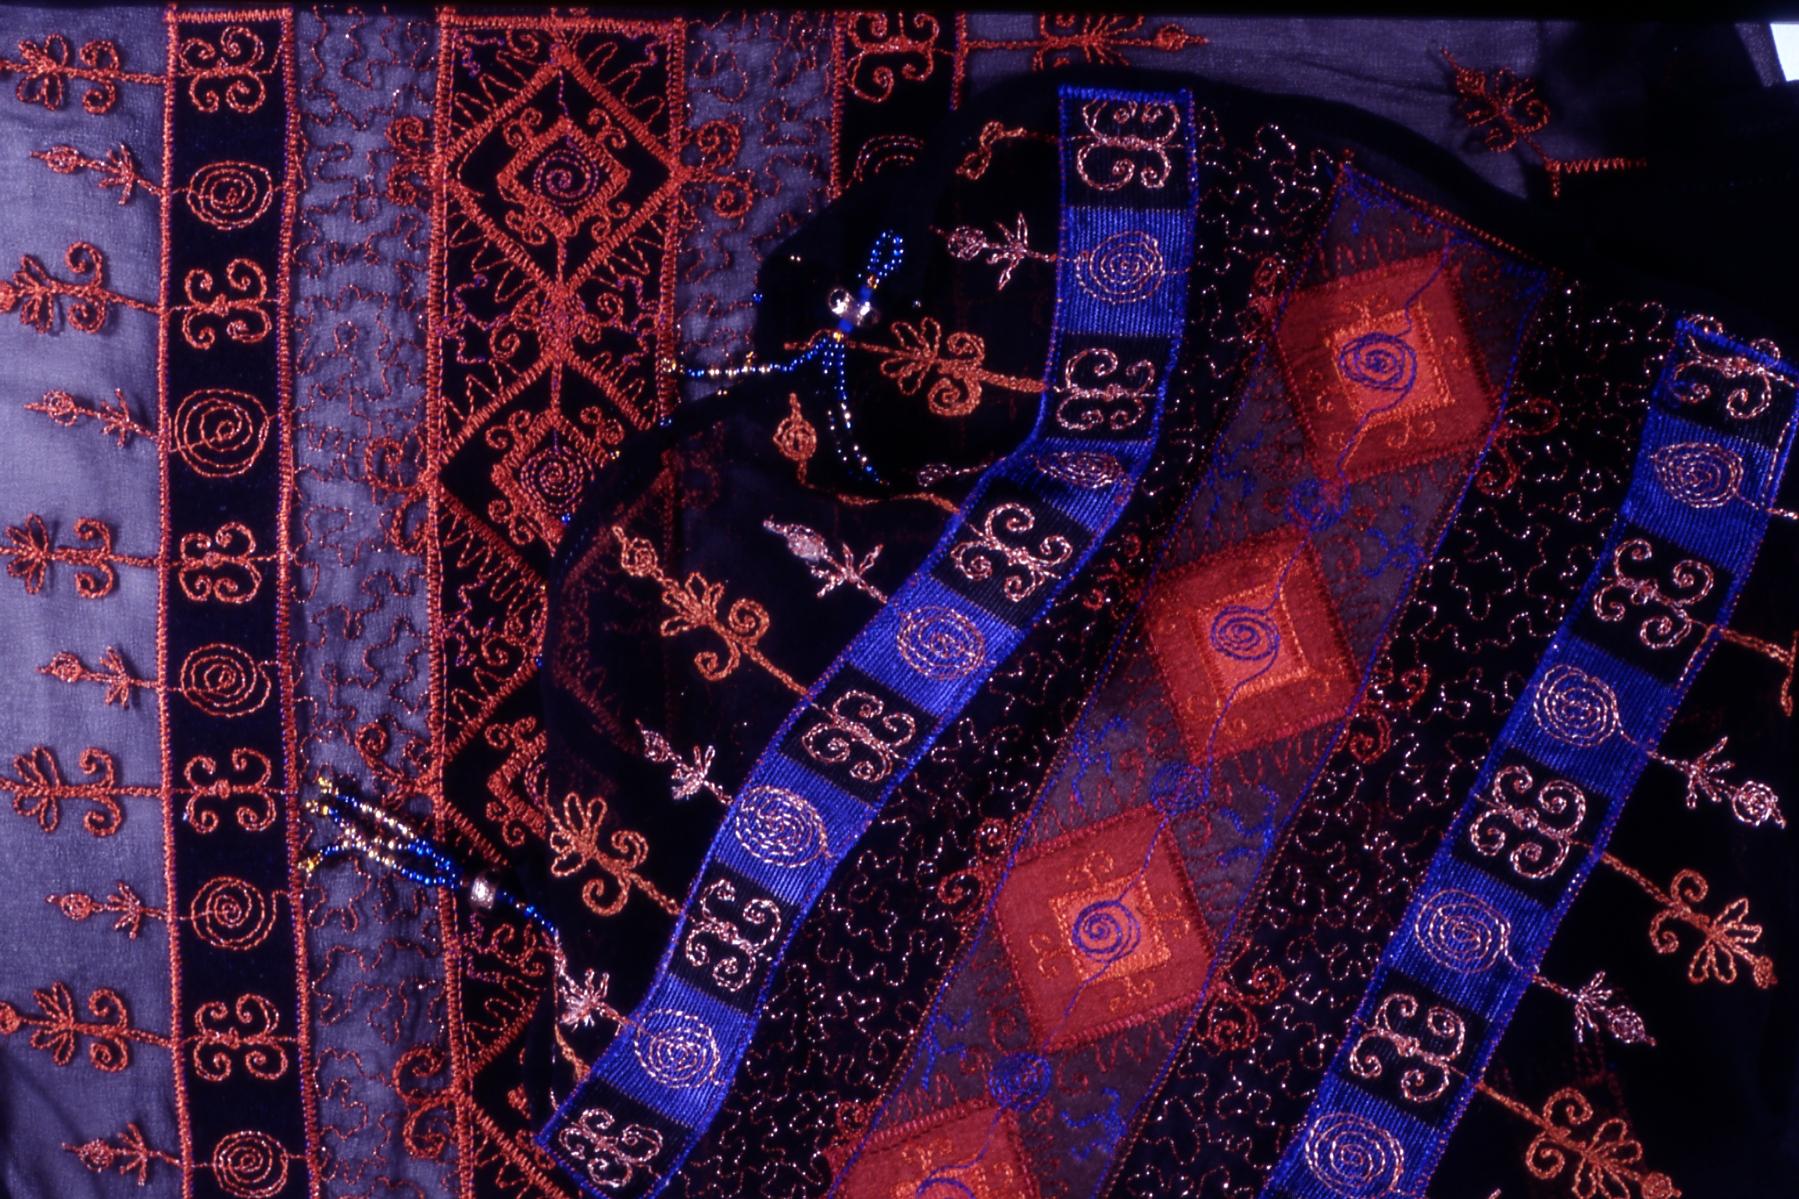 machine embroidered edge of chiffon scarf